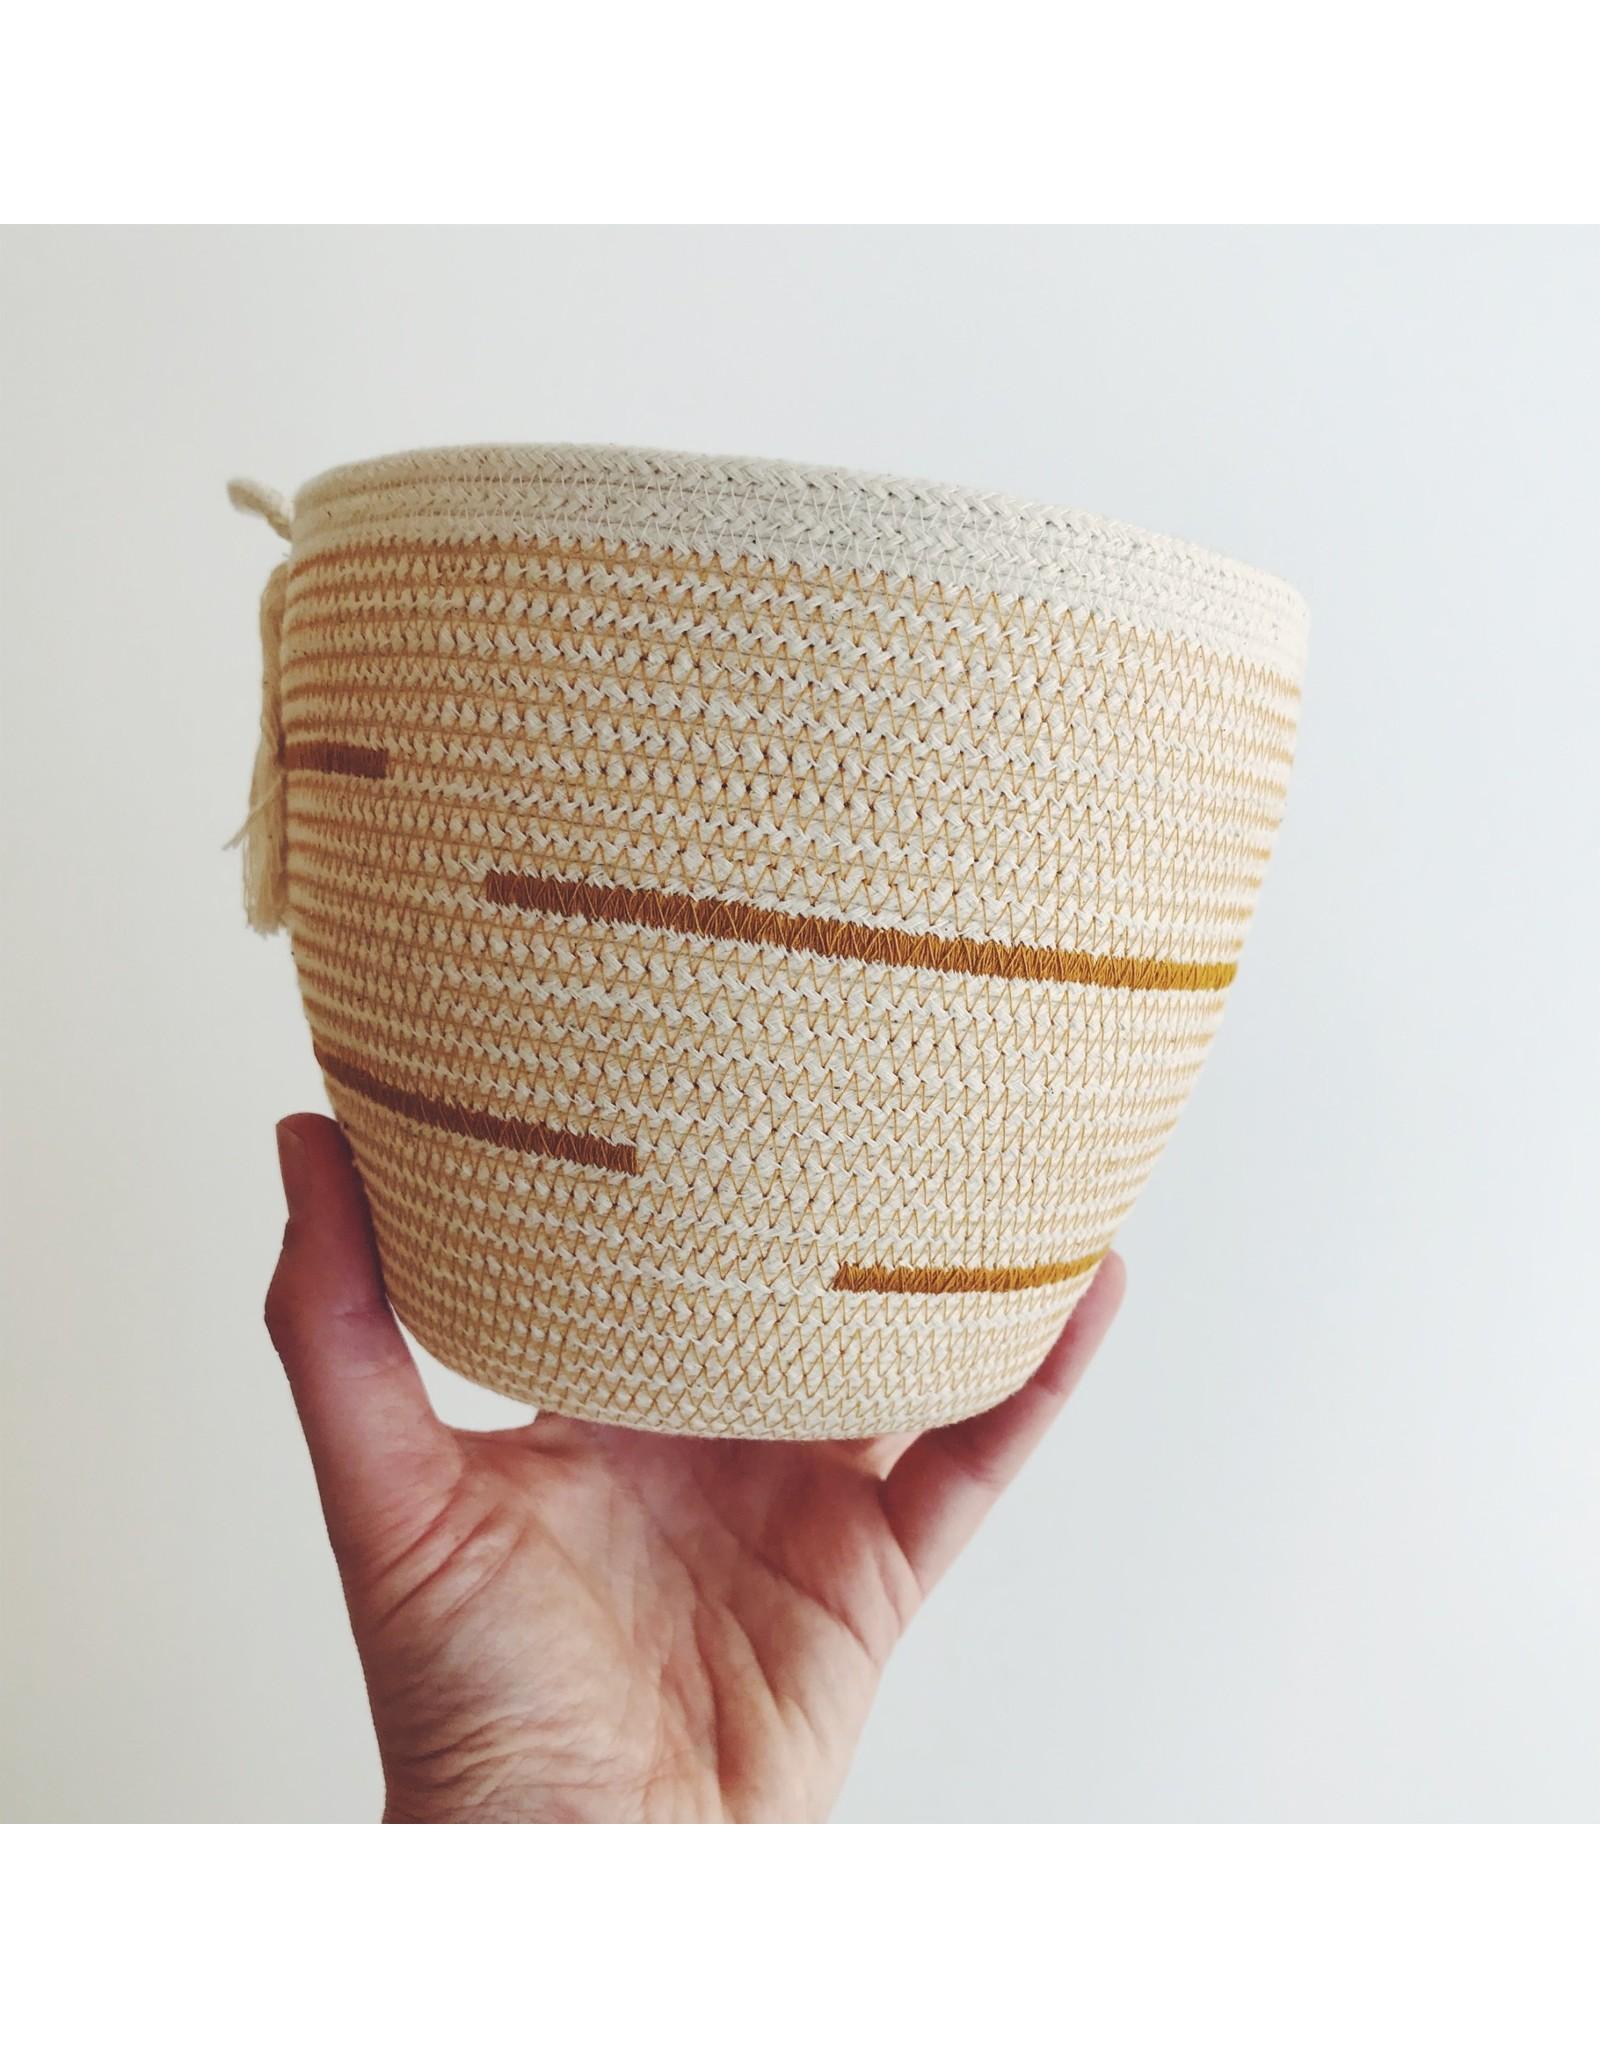 Textured Rope Basket